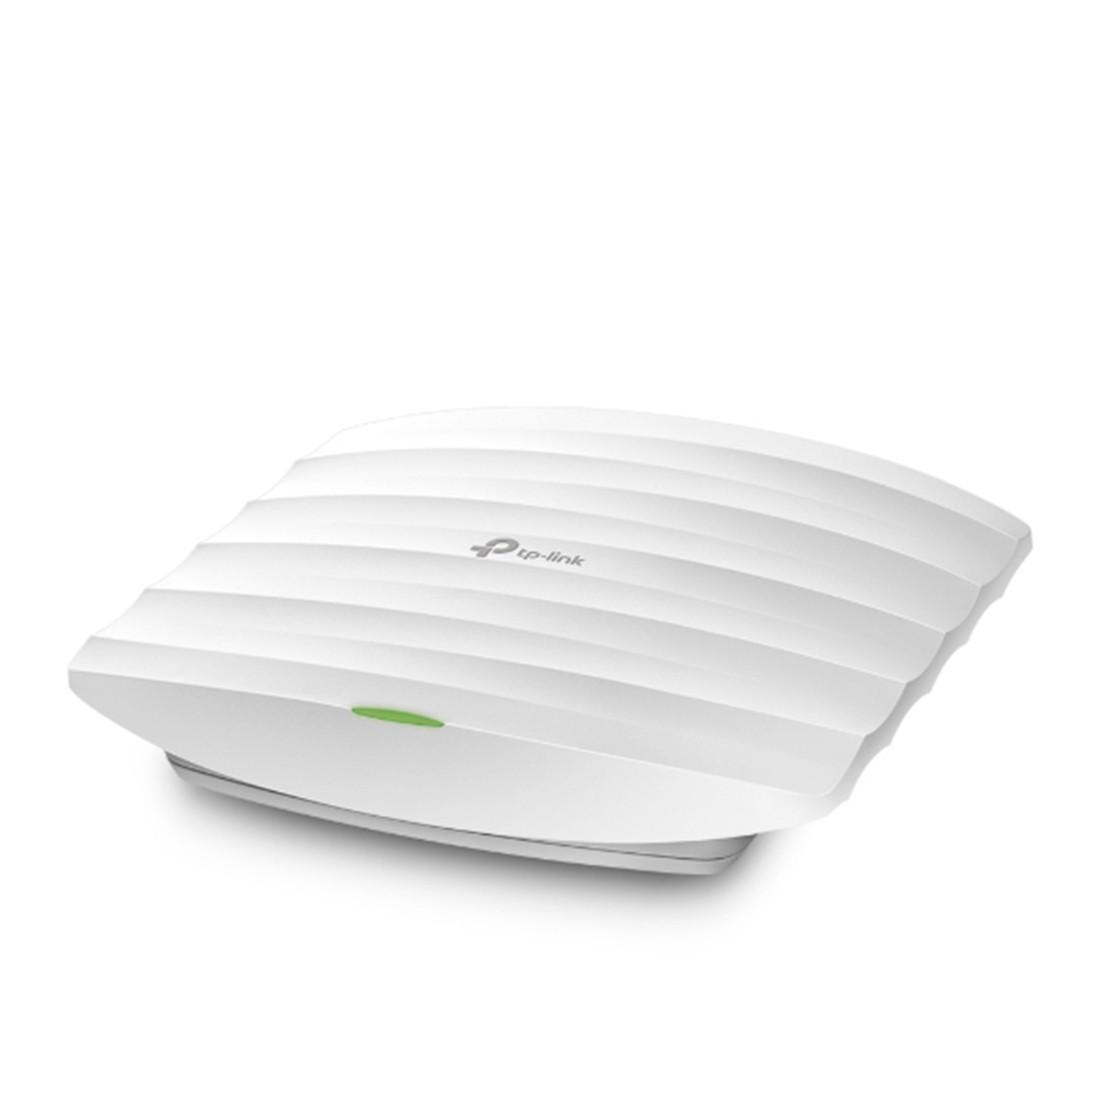 TP-Link Wi-Fi точка доступа EAP225